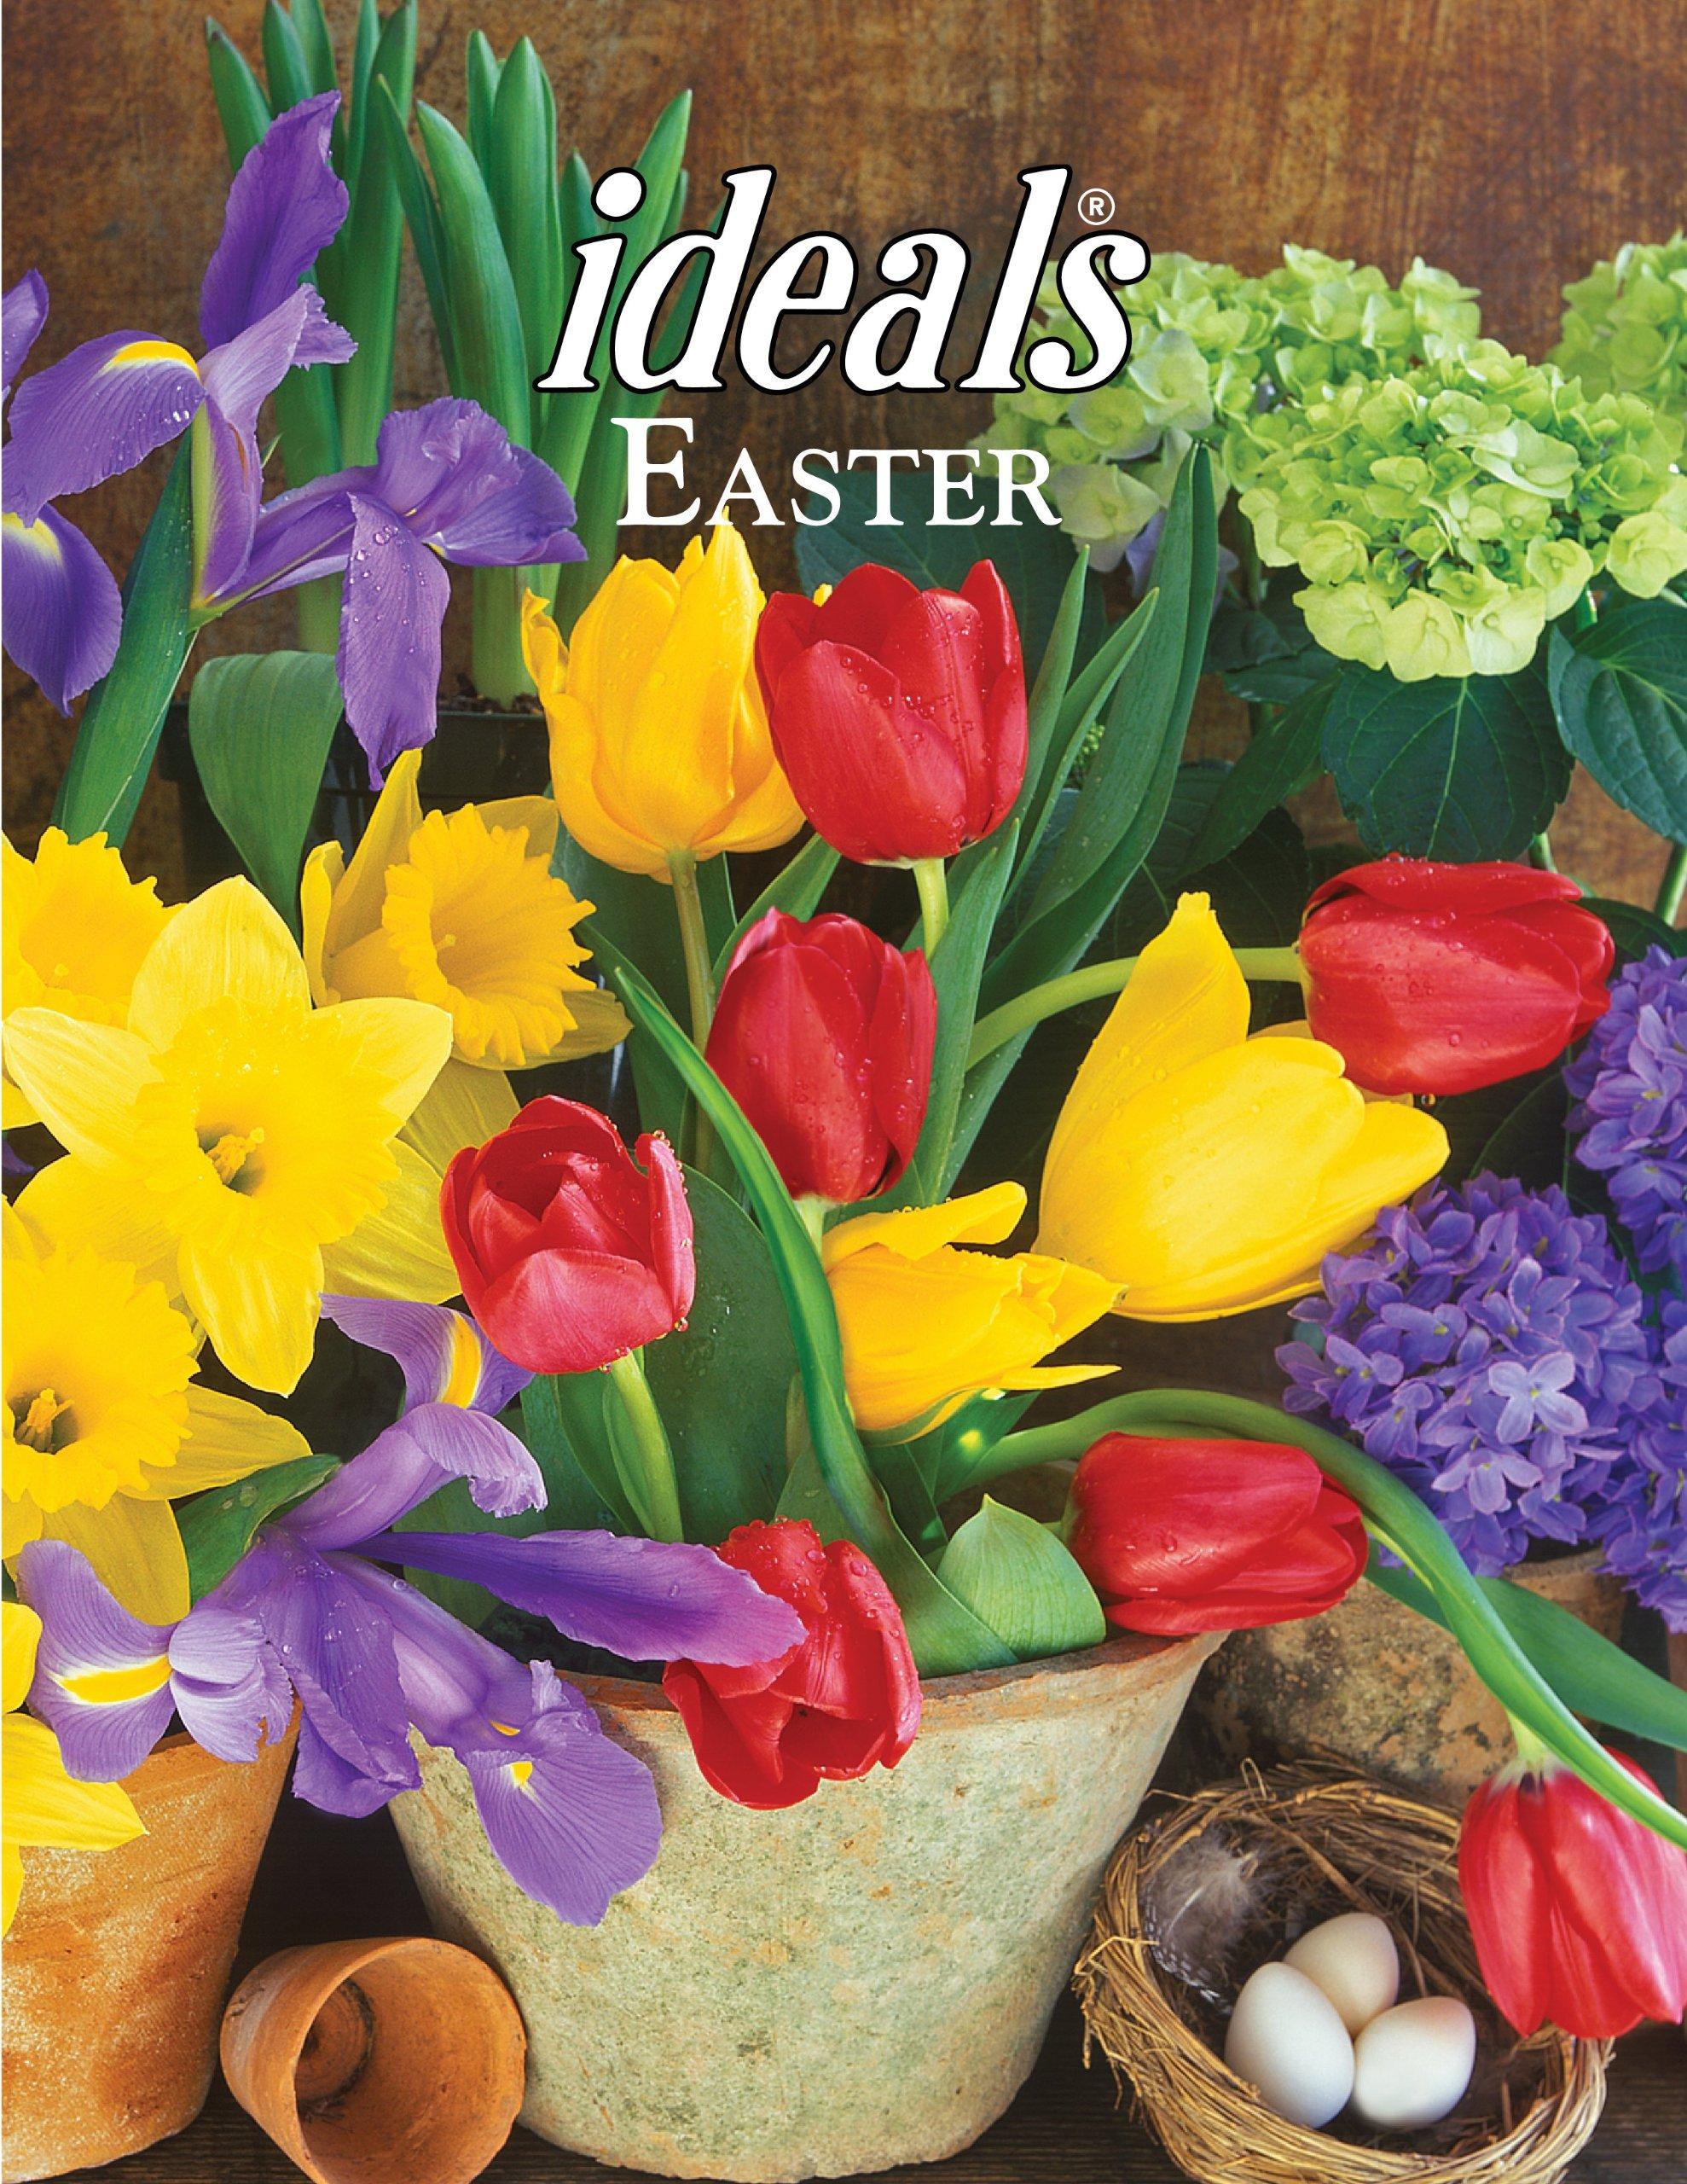 Easter Ideals 2014 (Ideals Easter)